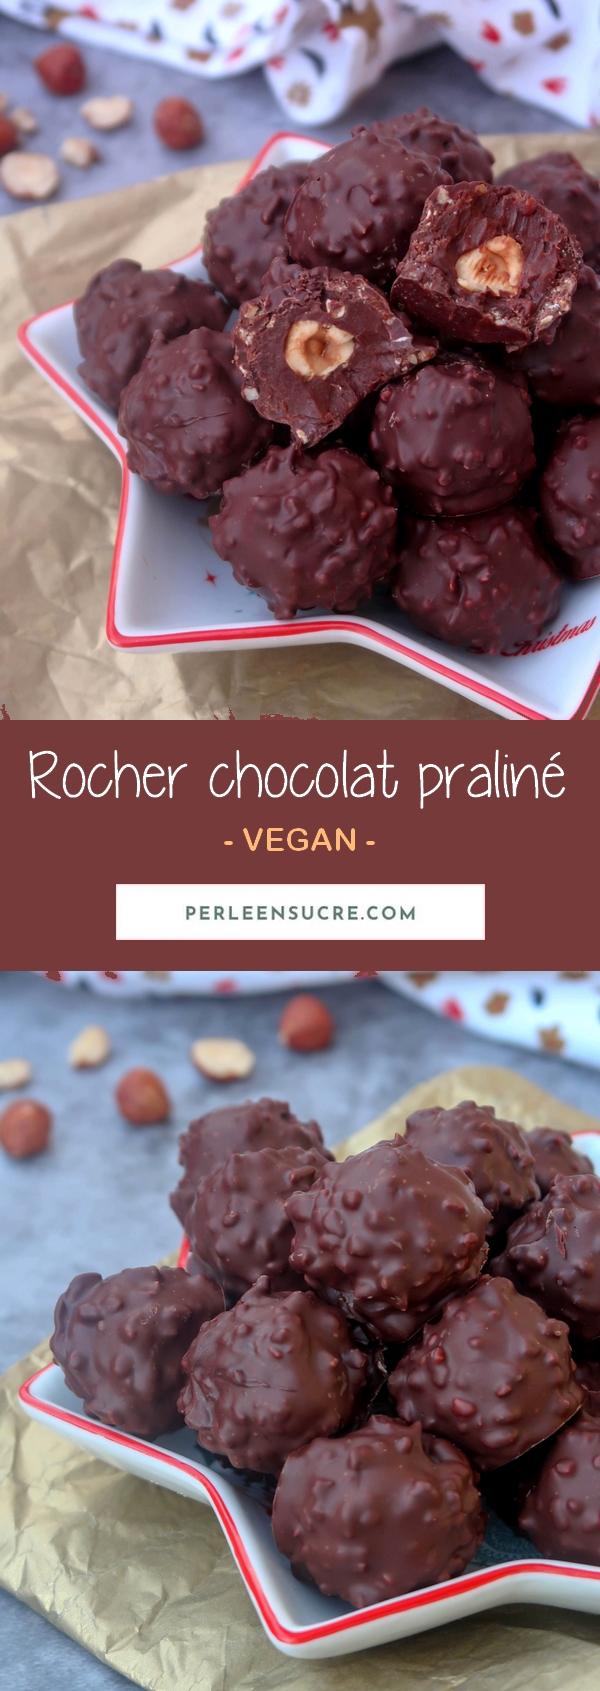 Rocher chocolat praliné {vegan}